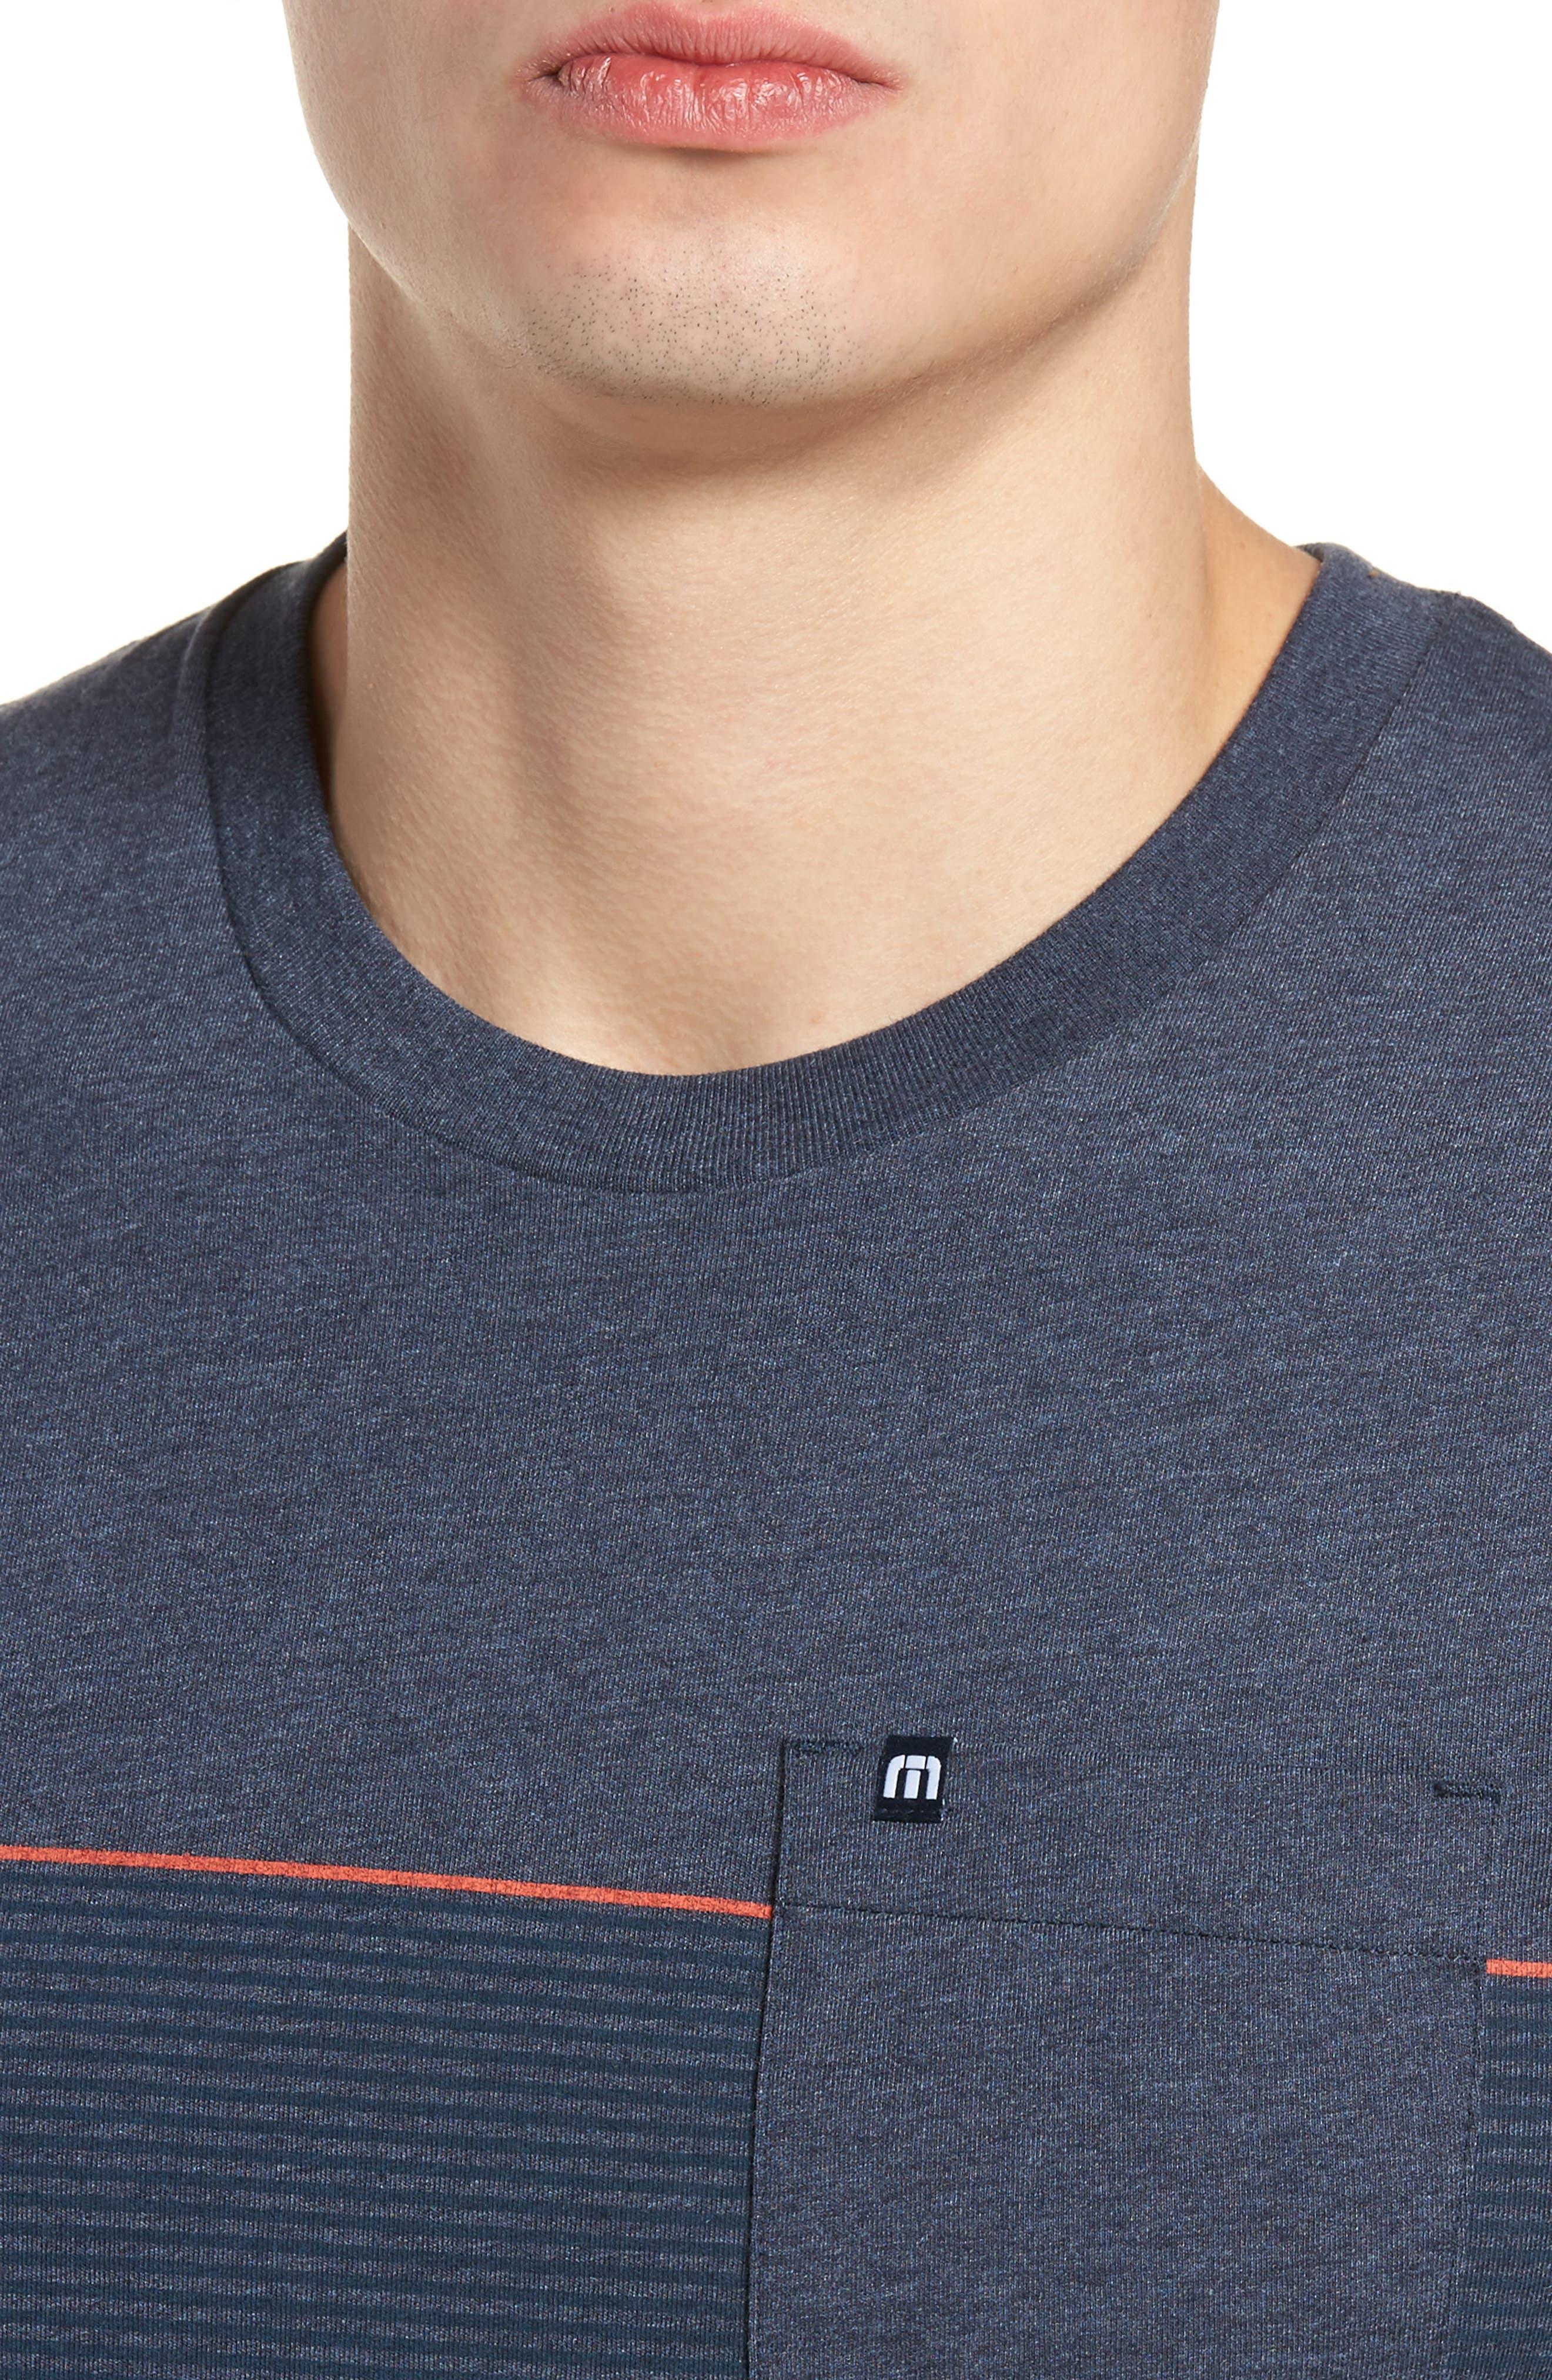 Jeramie Stripe Pocket T-Shirt,                             Alternate thumbnail 4, color,                             Blue Nights/ Dusk Blue